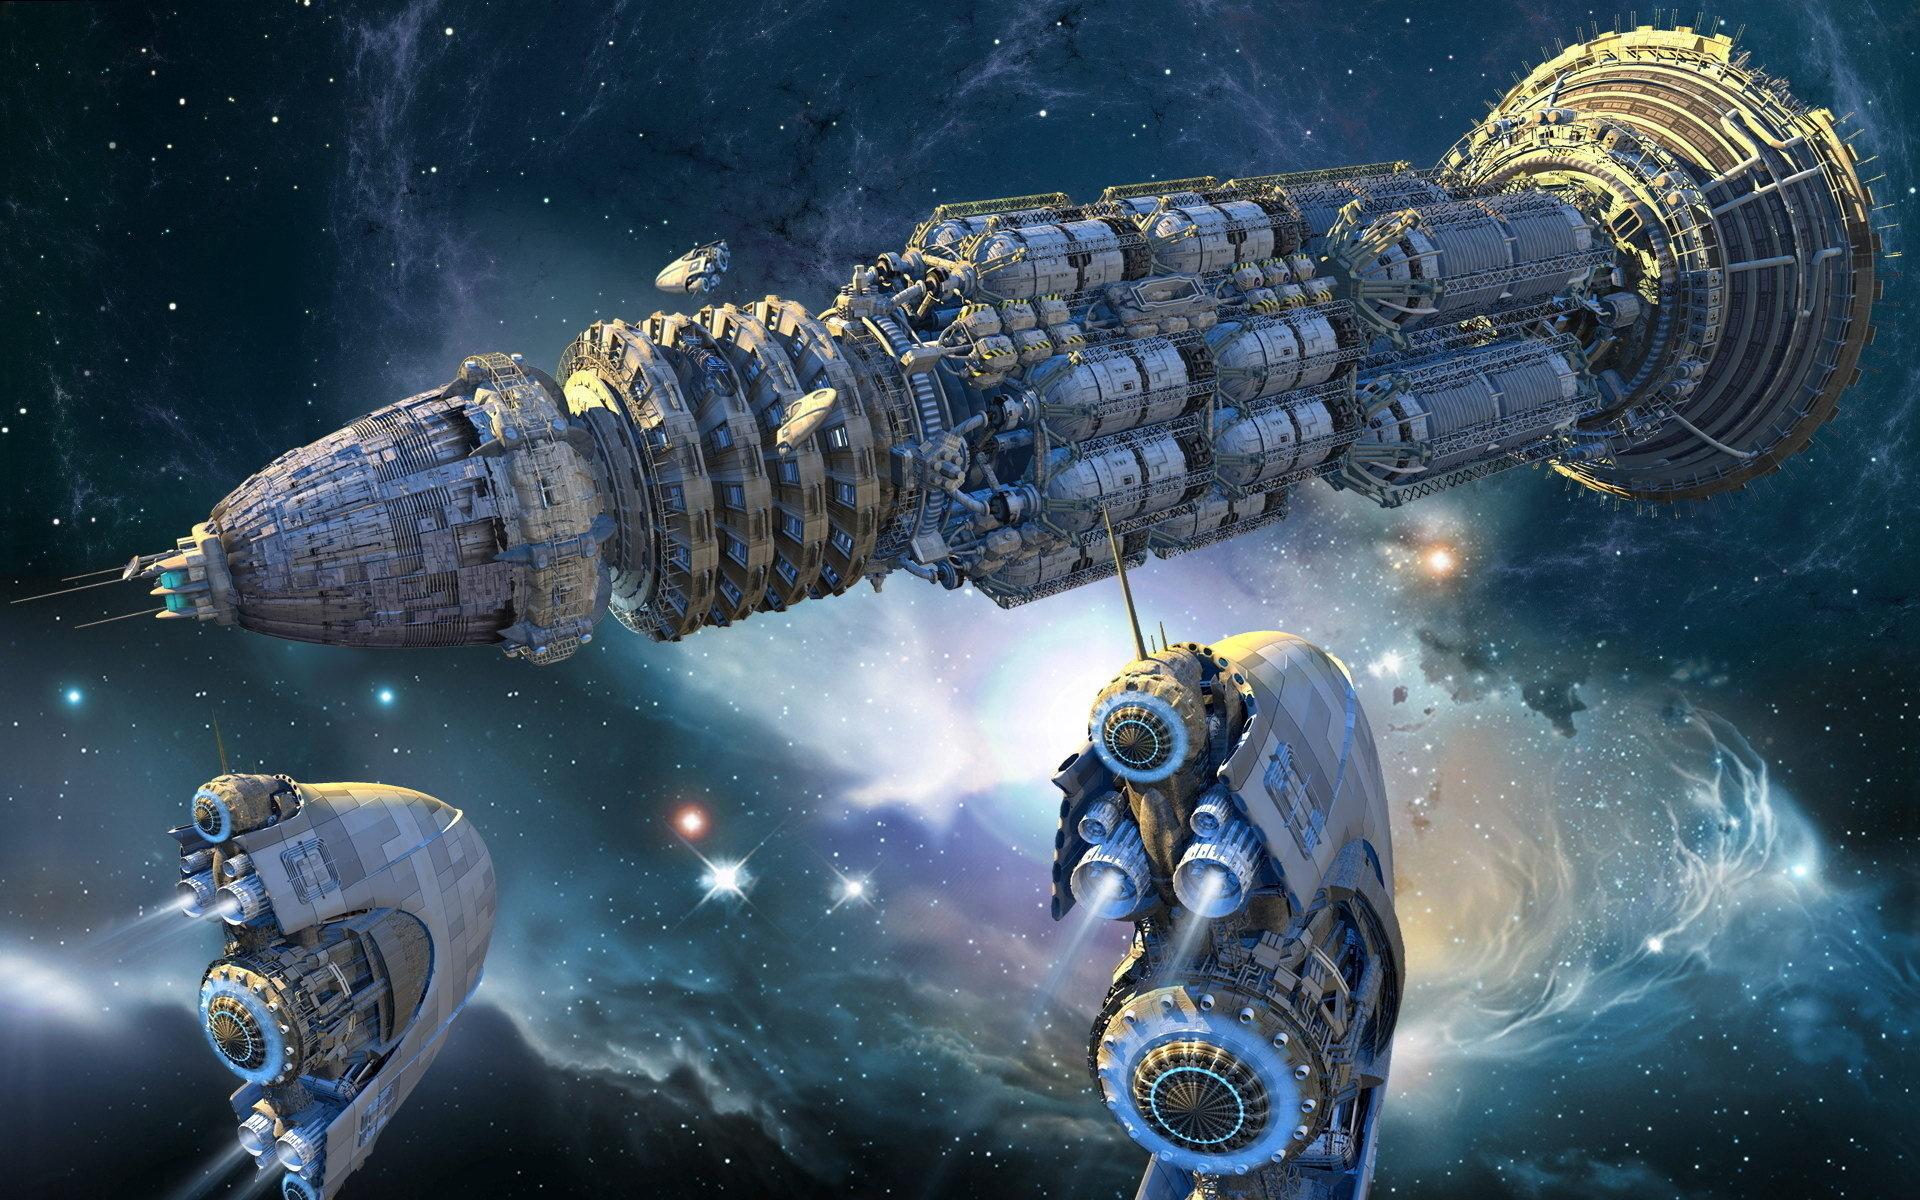 Космические корабли фантастика картинка